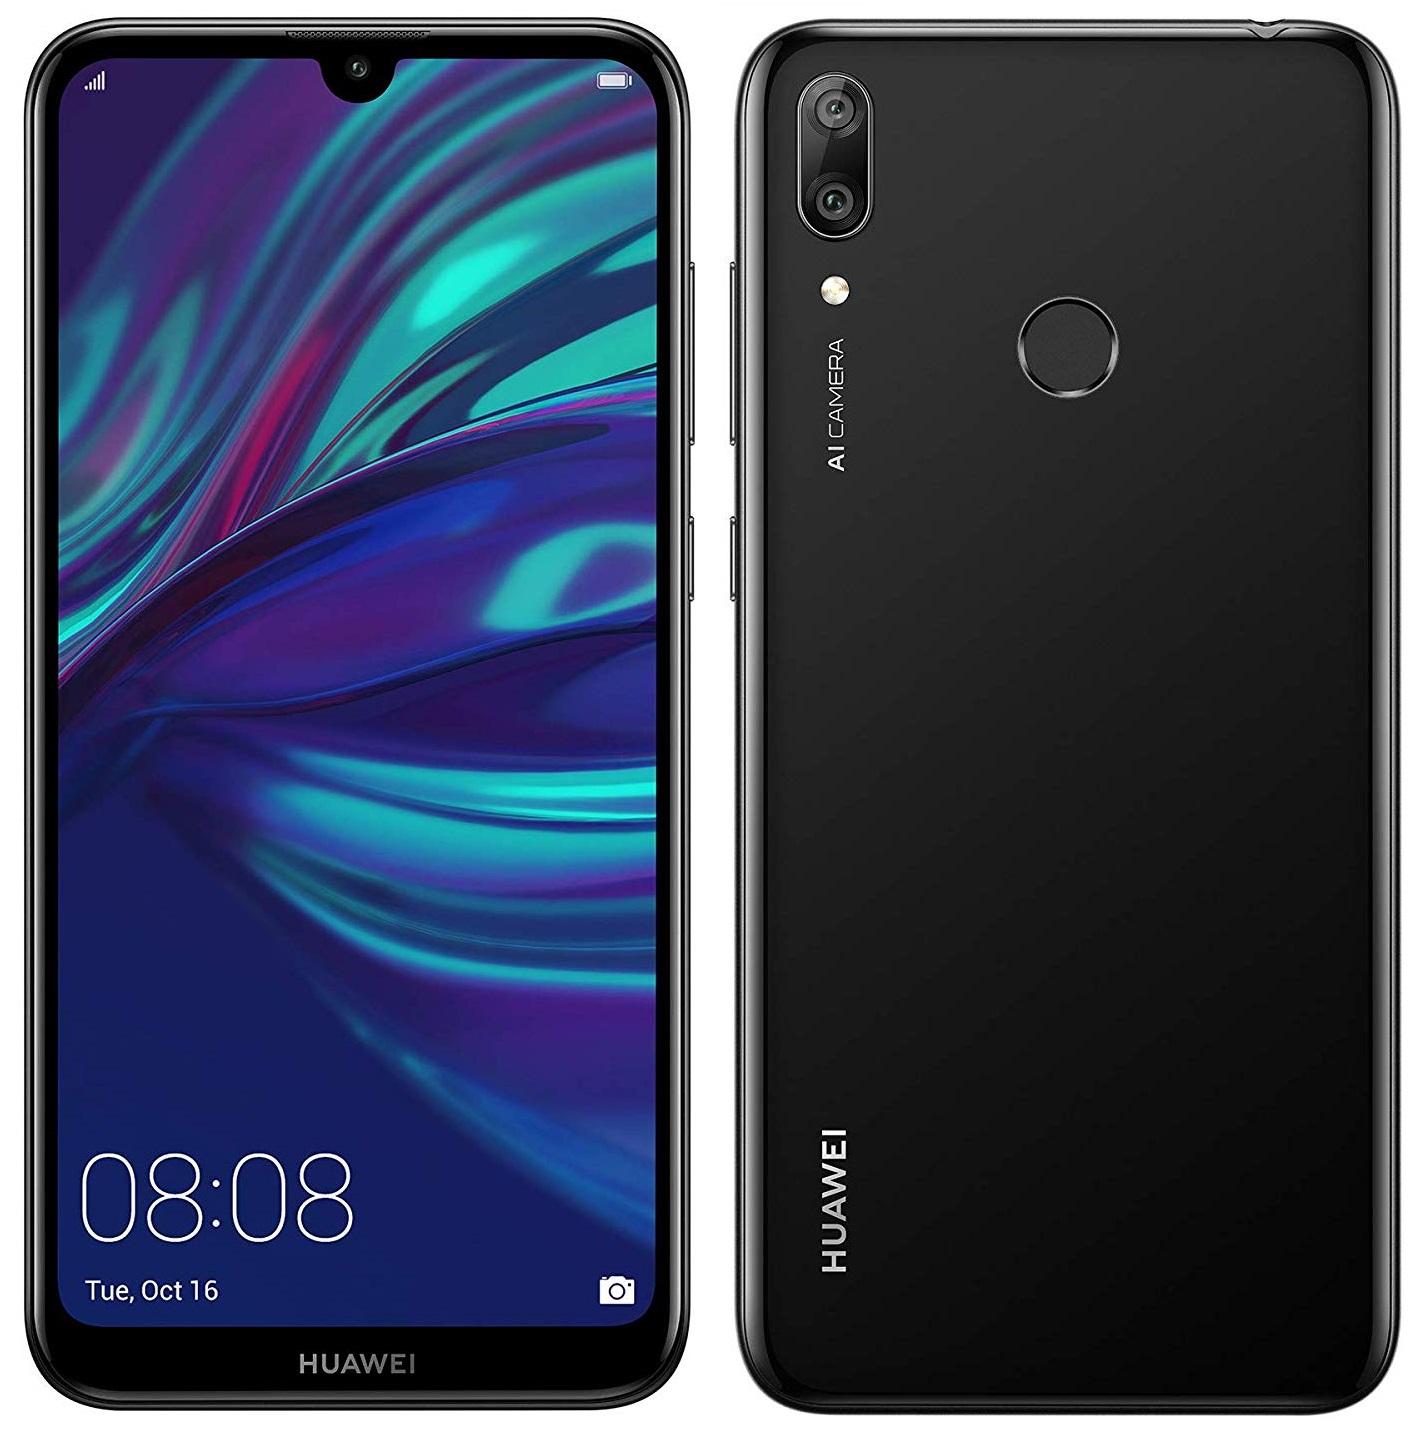 Details about Huawei Y7 Prime 2019 4G Smartphone 3GB RAM 32GB Unlocked -  Midnight Black A